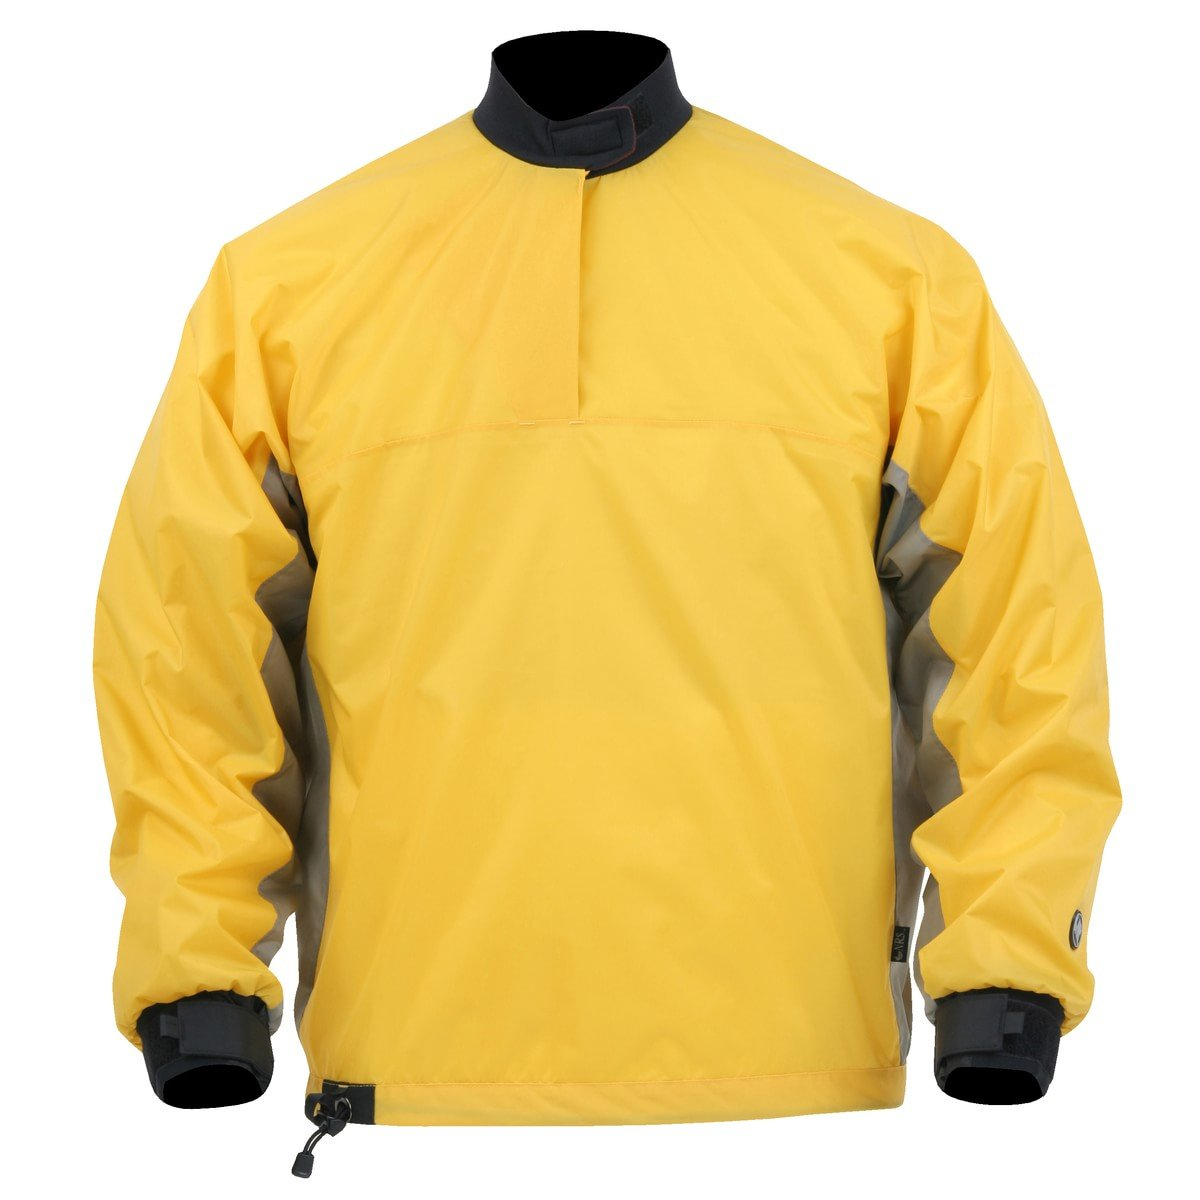 NRS Rio Top Paddle Jacket Yellow Small